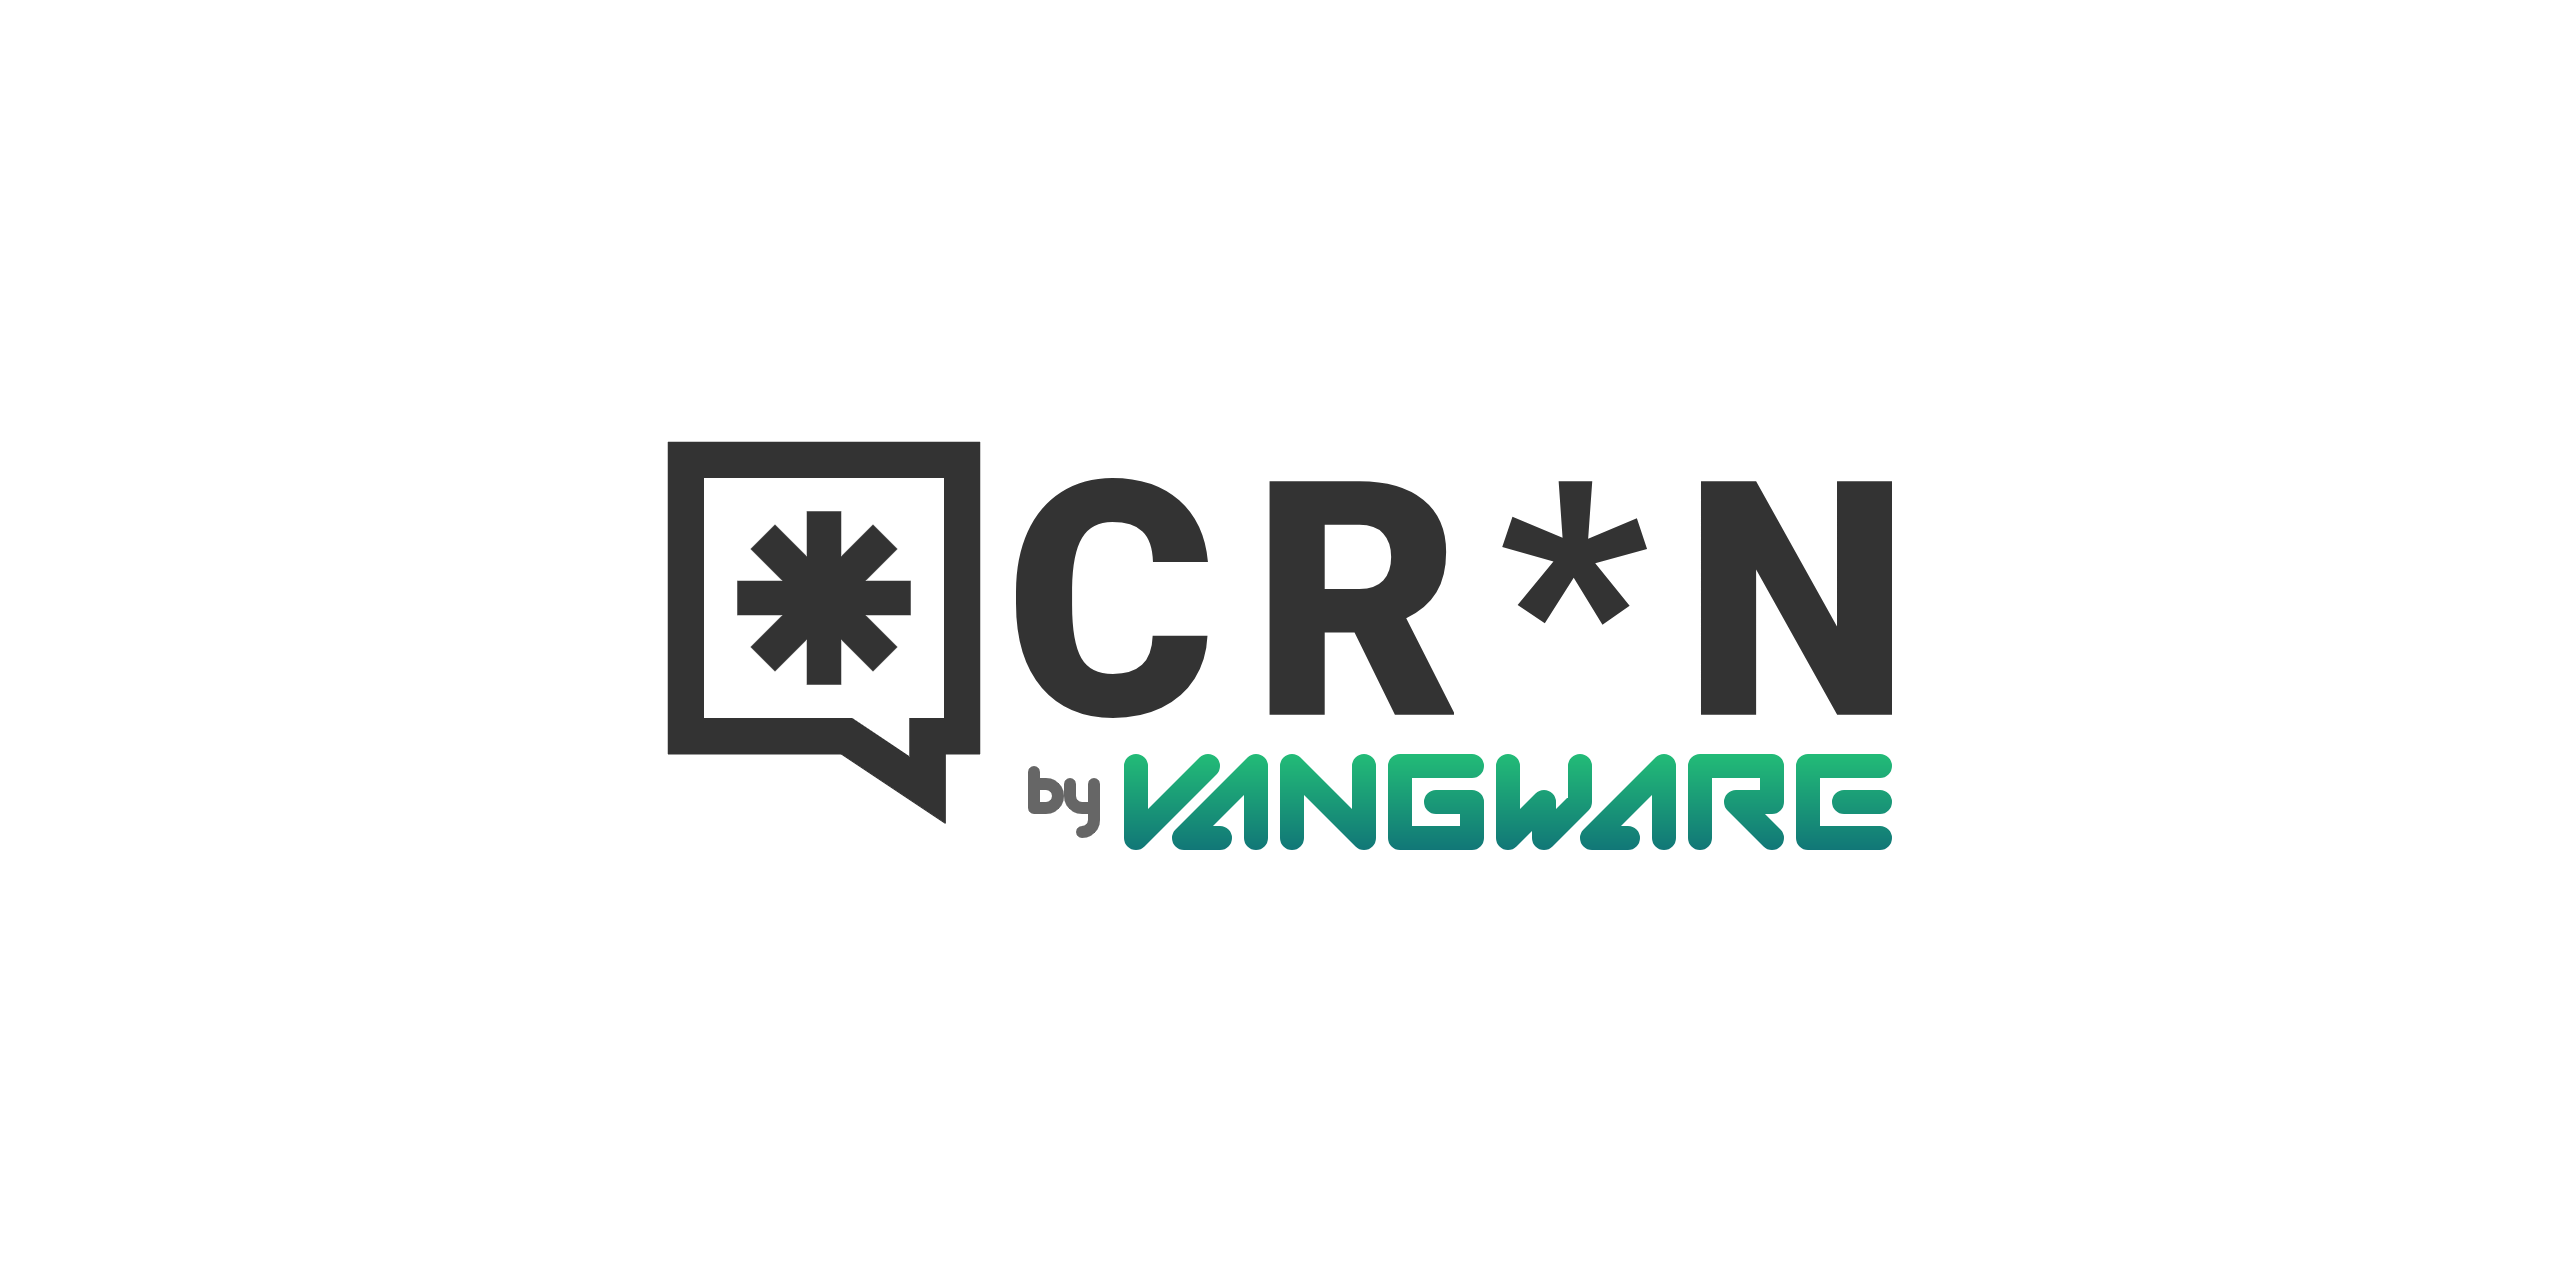 Cron by Vangware